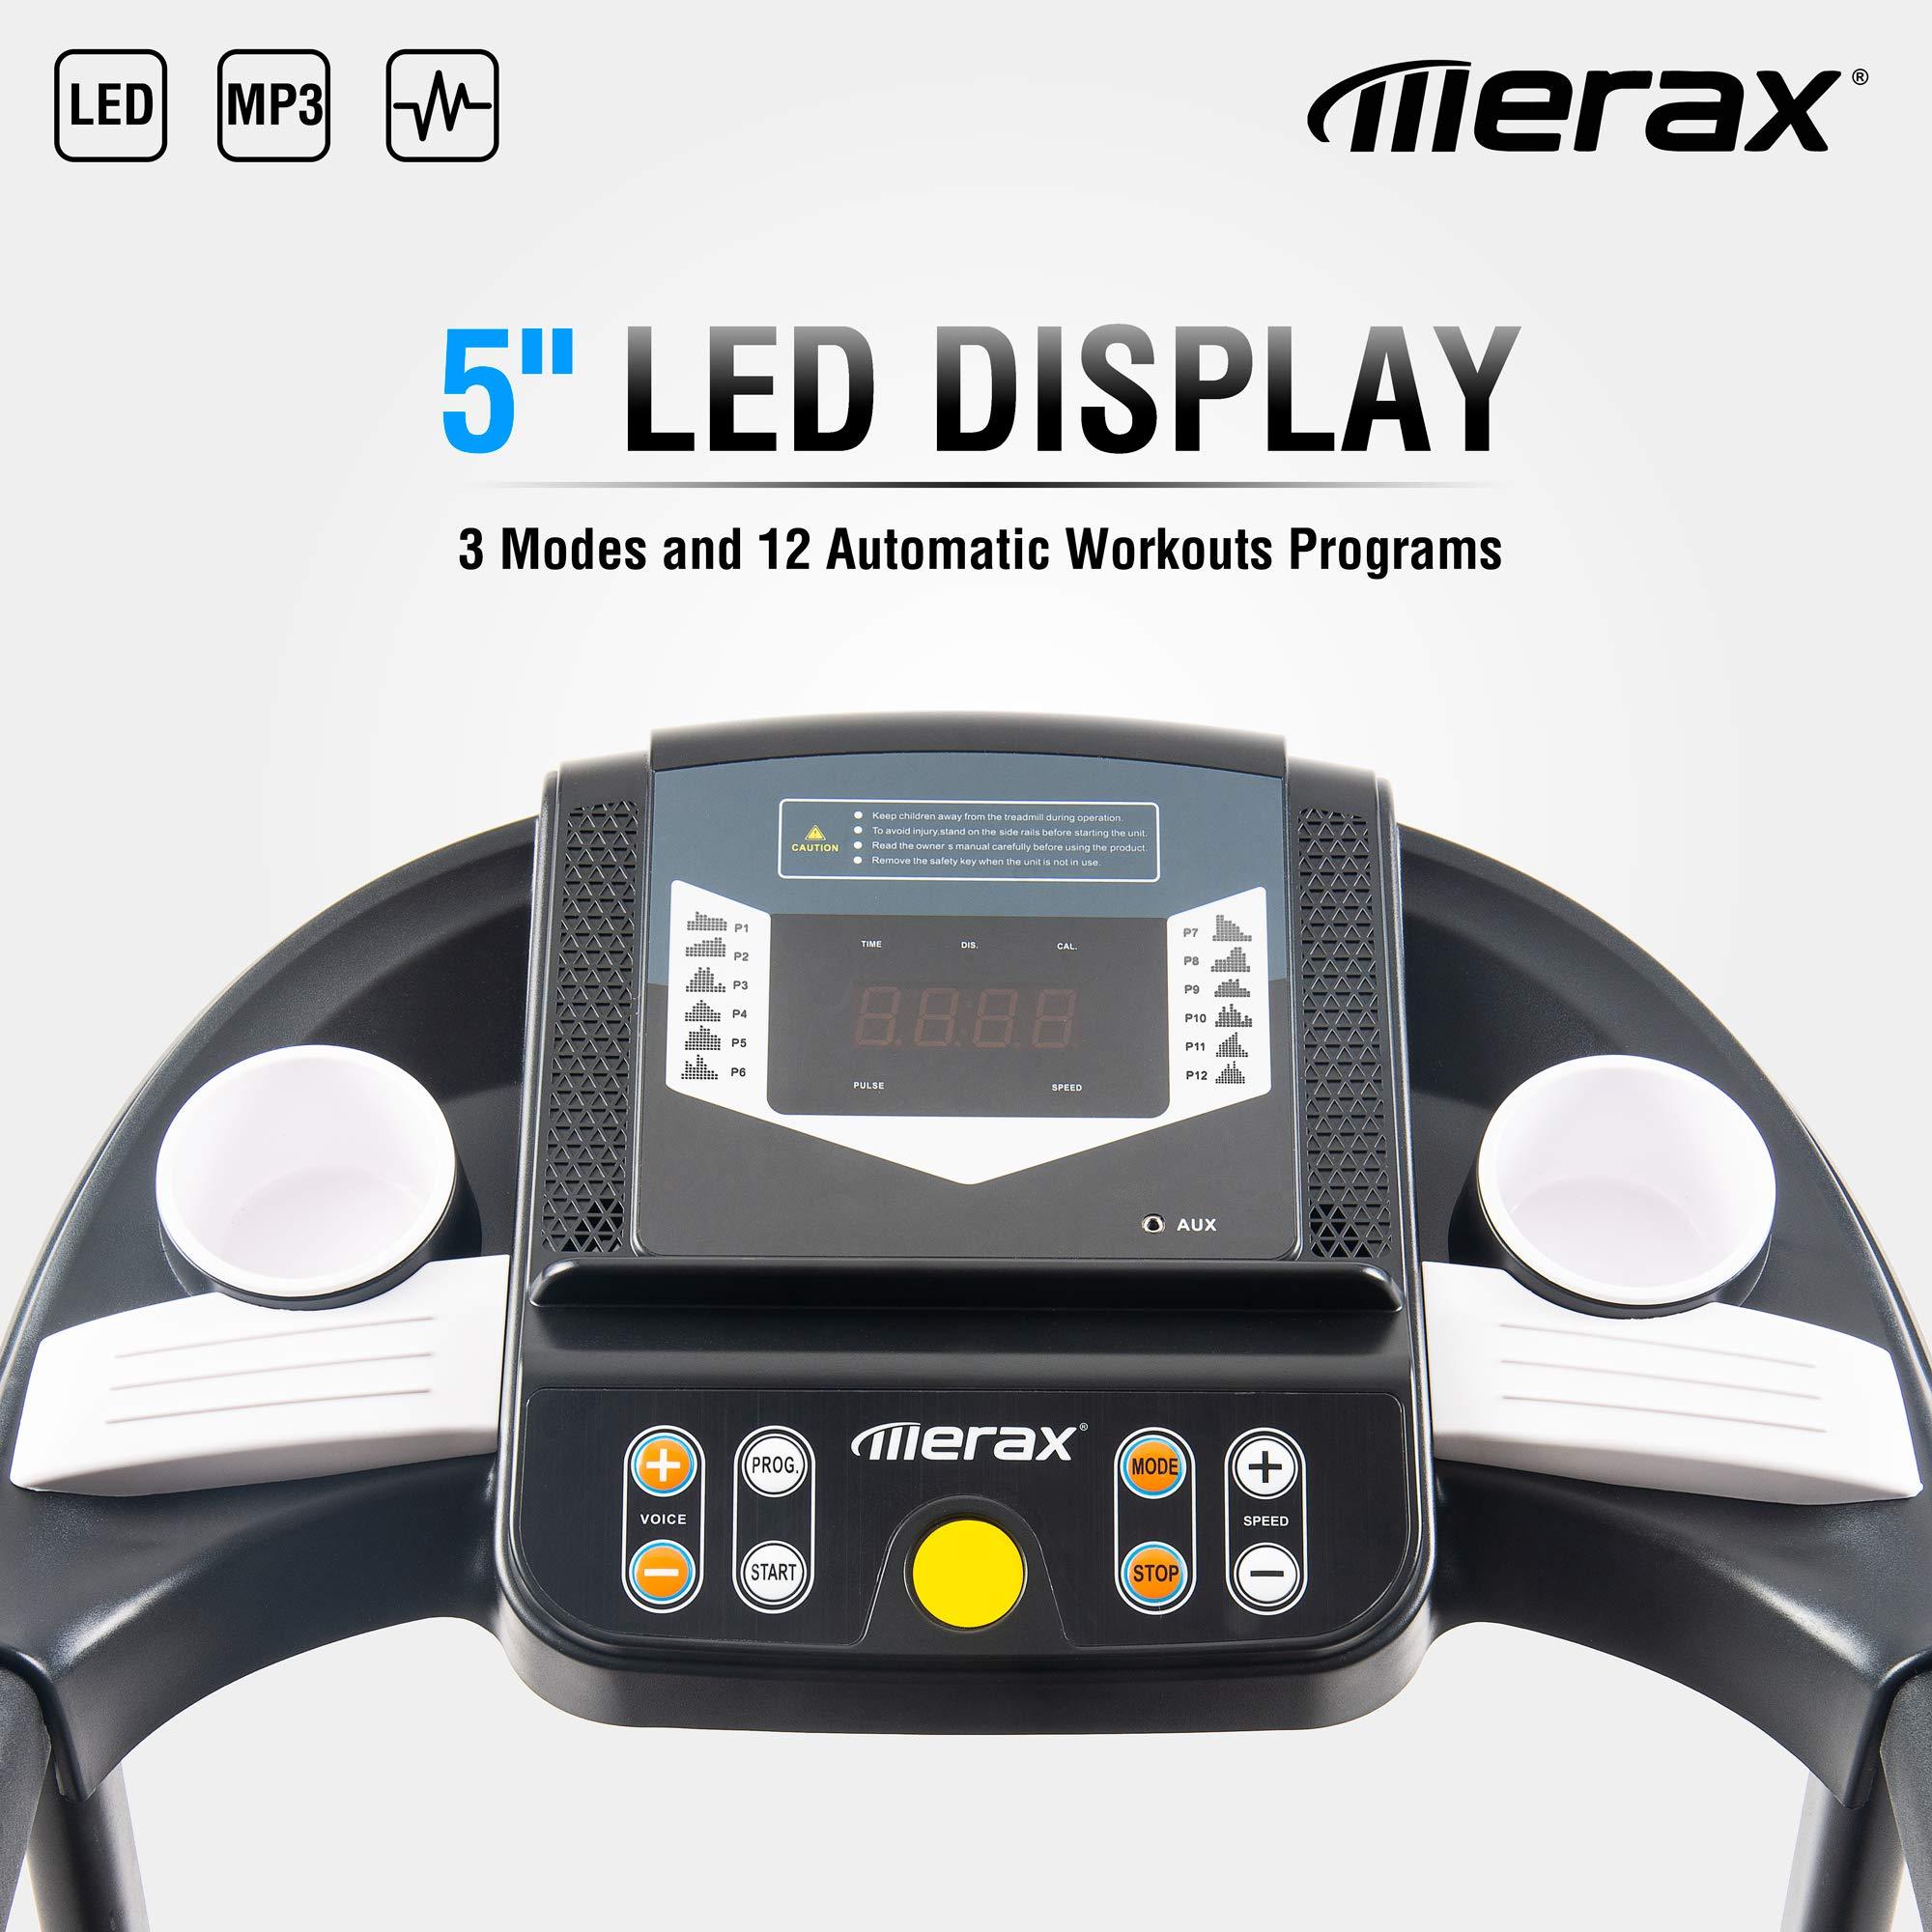 Merax Easy Assembly Folding Electric Treadmill Motorized Running Machine by Merax (Image #8)